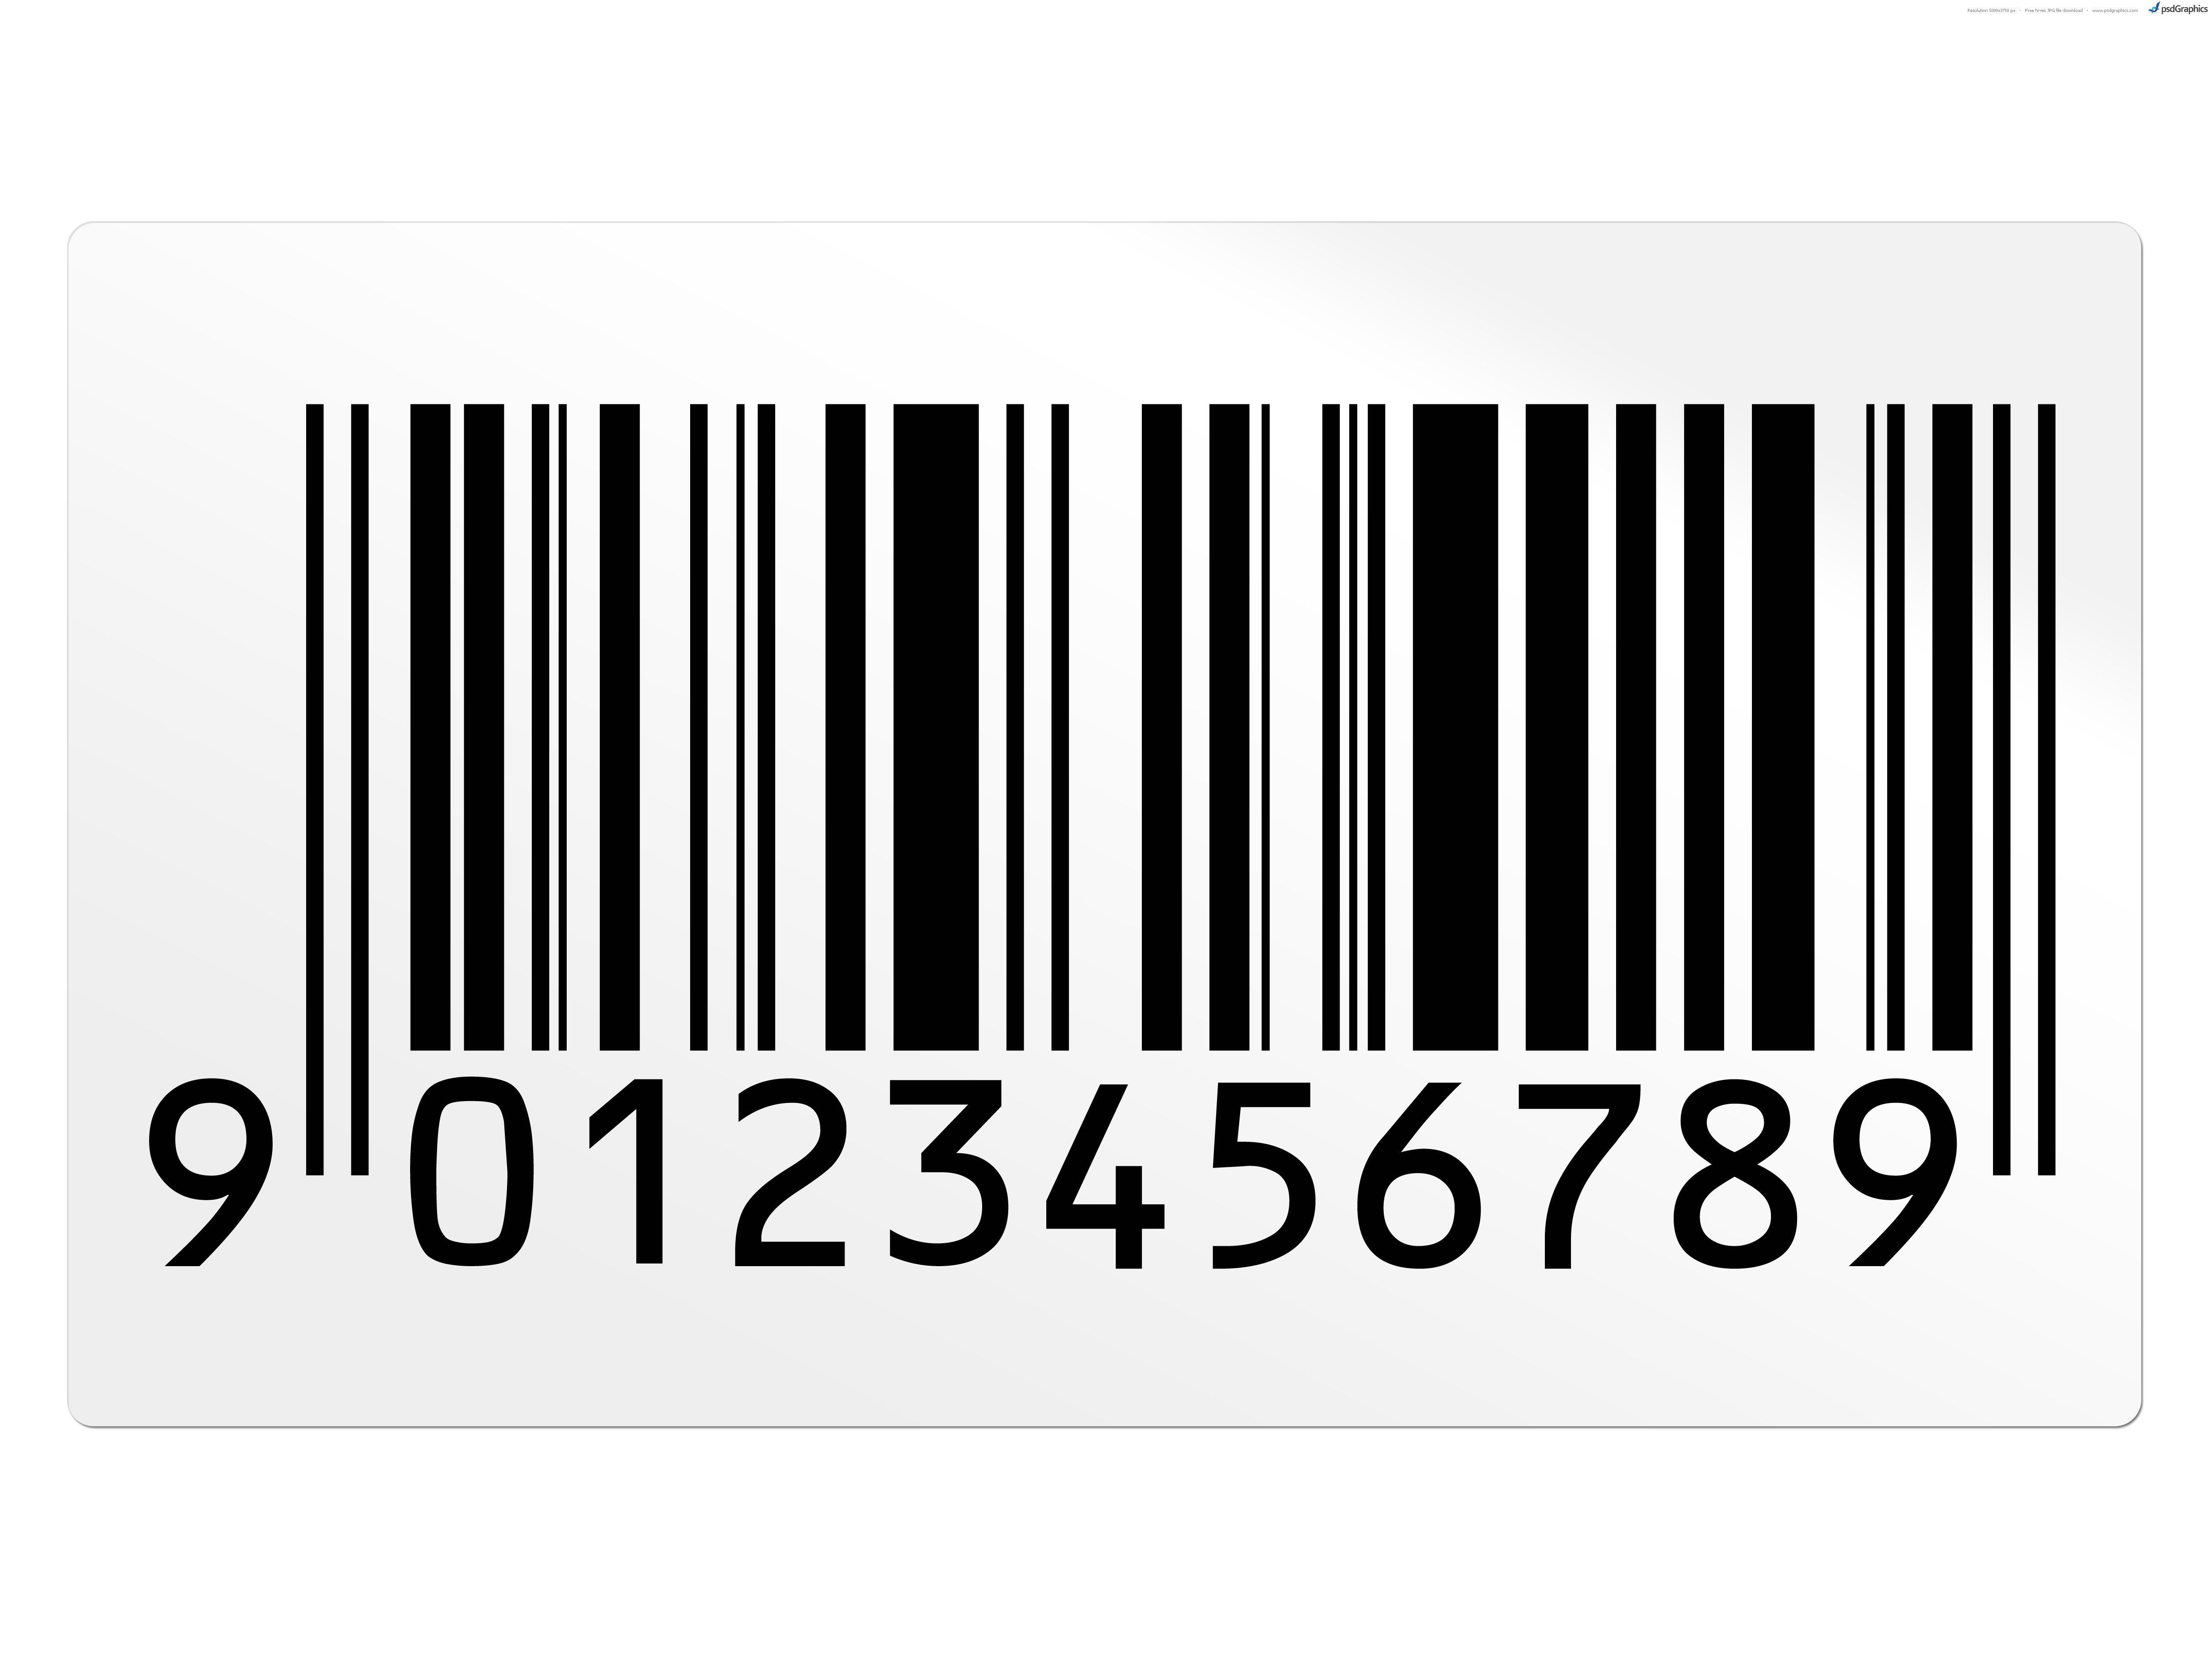 Barcode clipart magazine barcode PSDGraphics graphics Barcode Barcode font